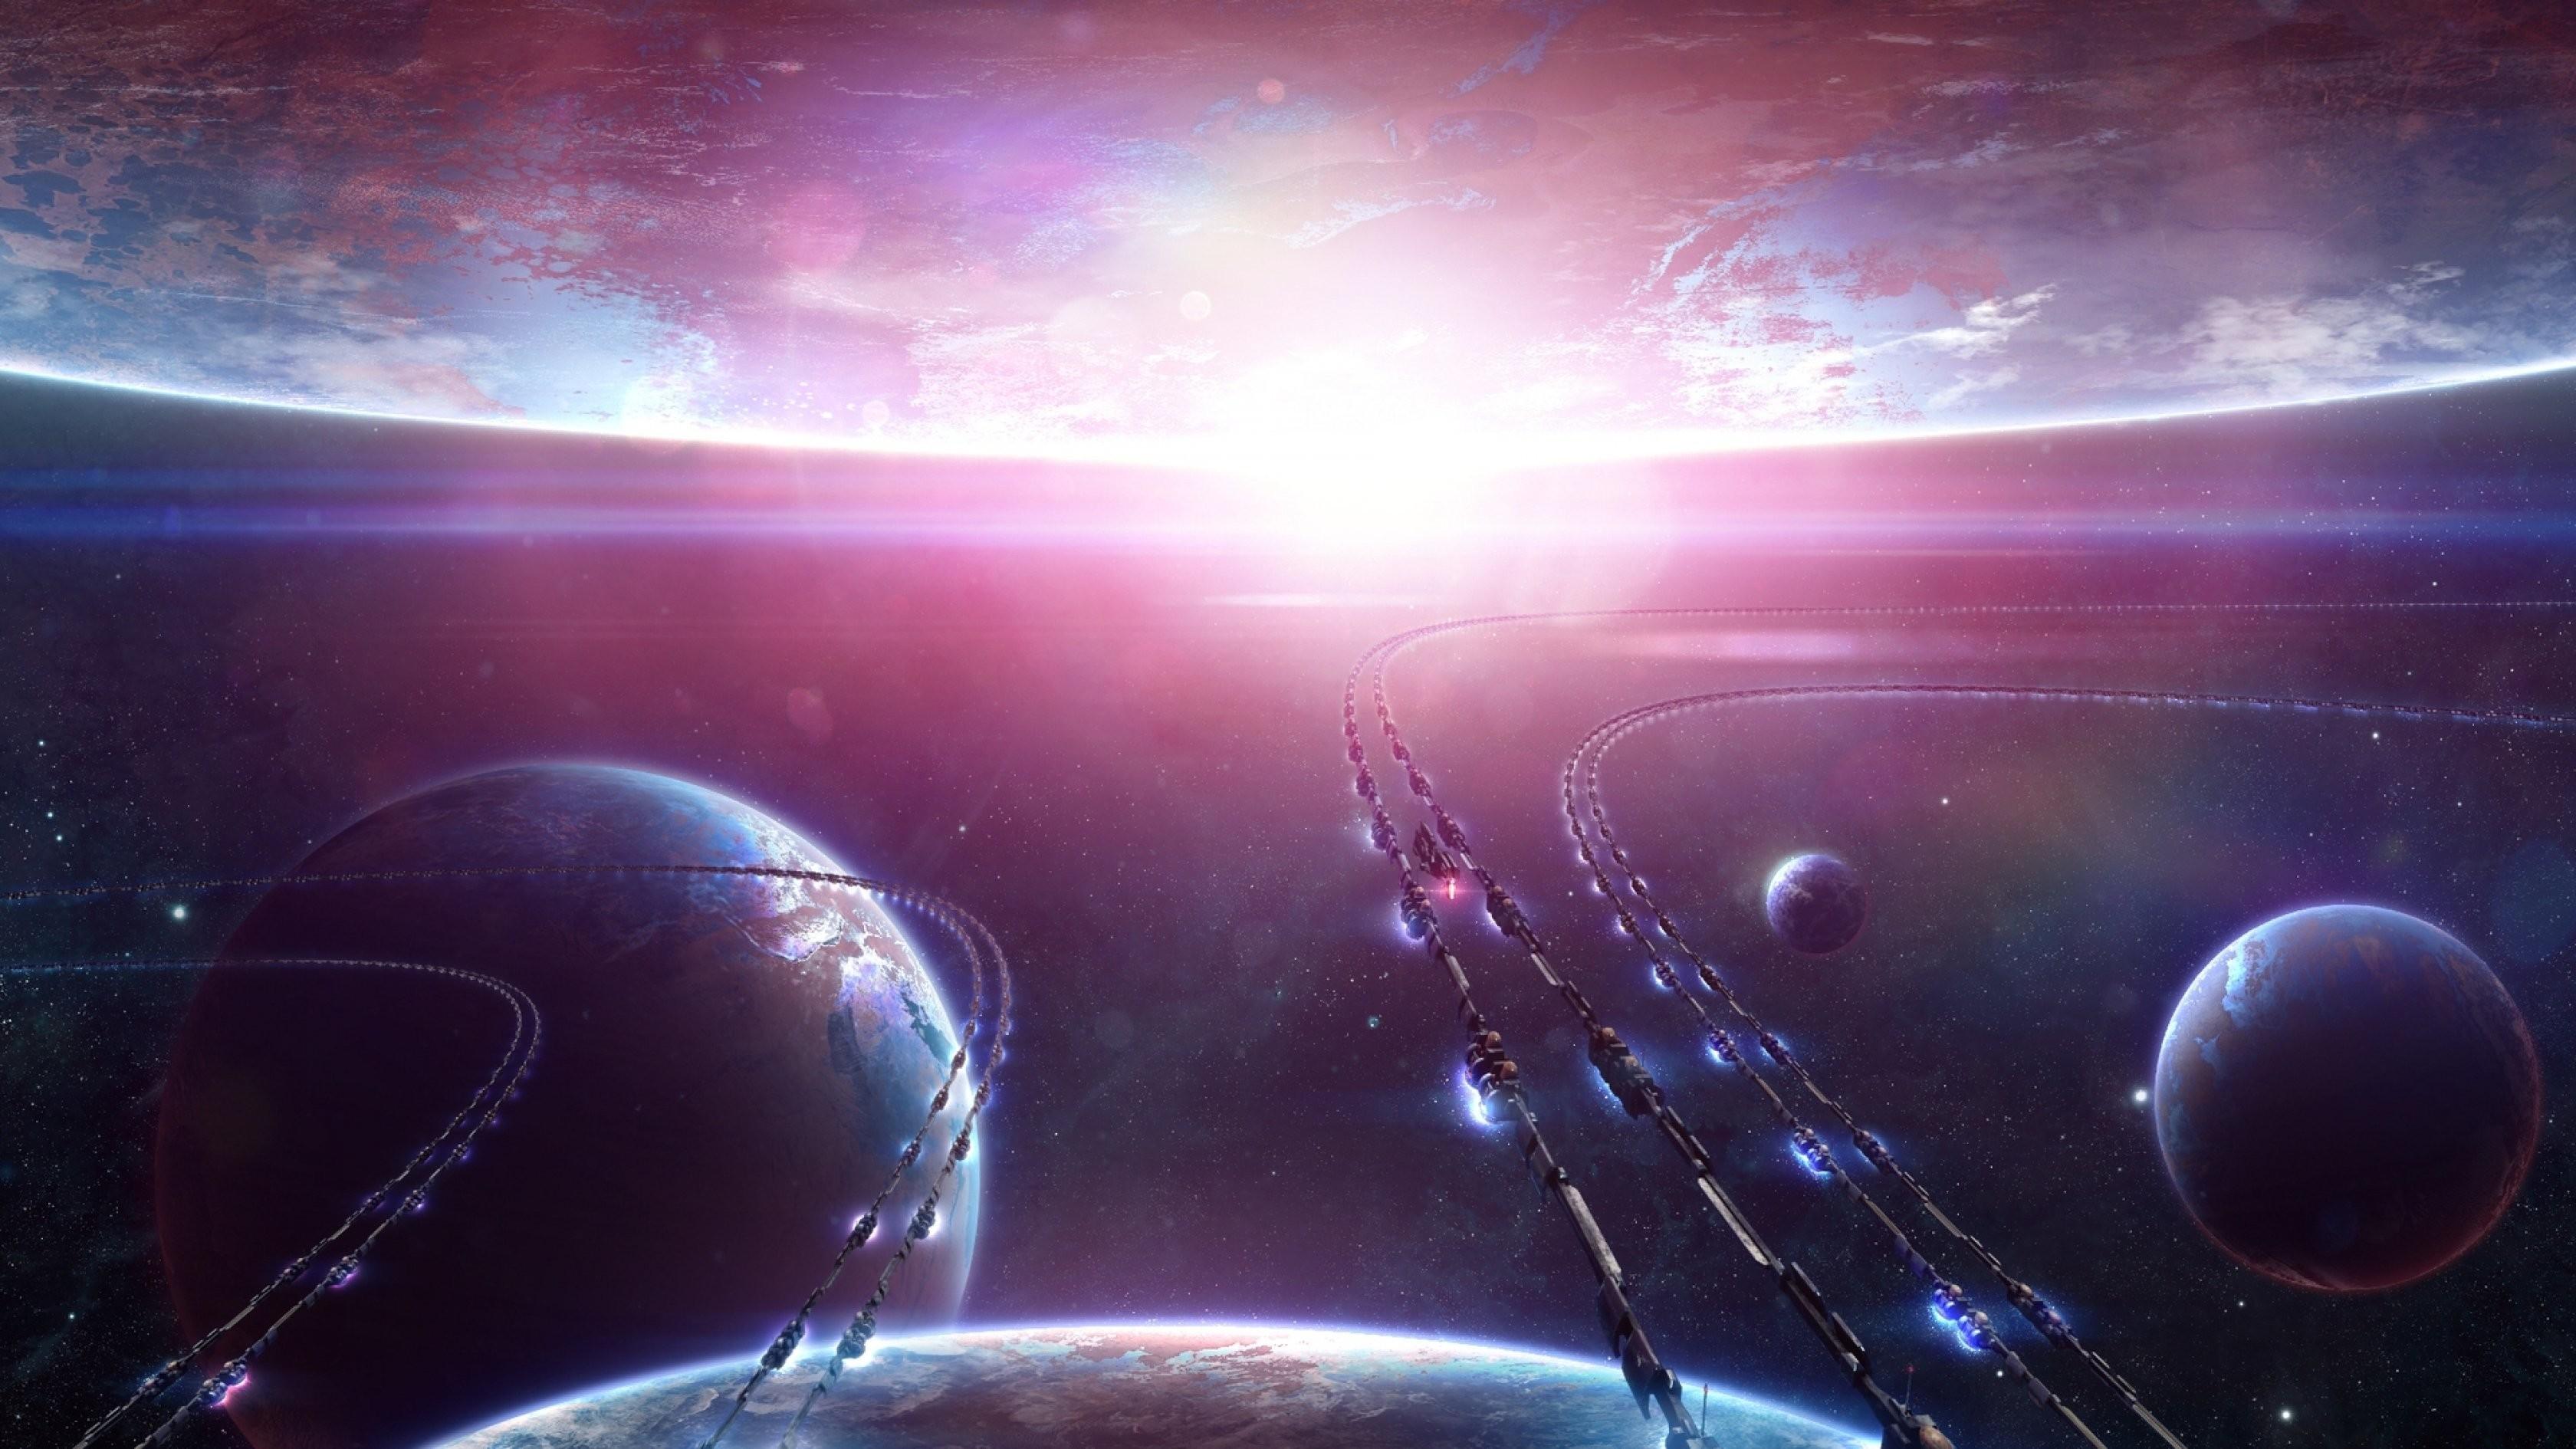 Planetscape sci-fi planet landscape space art artwork wallpaper      660349   WallpaperUP